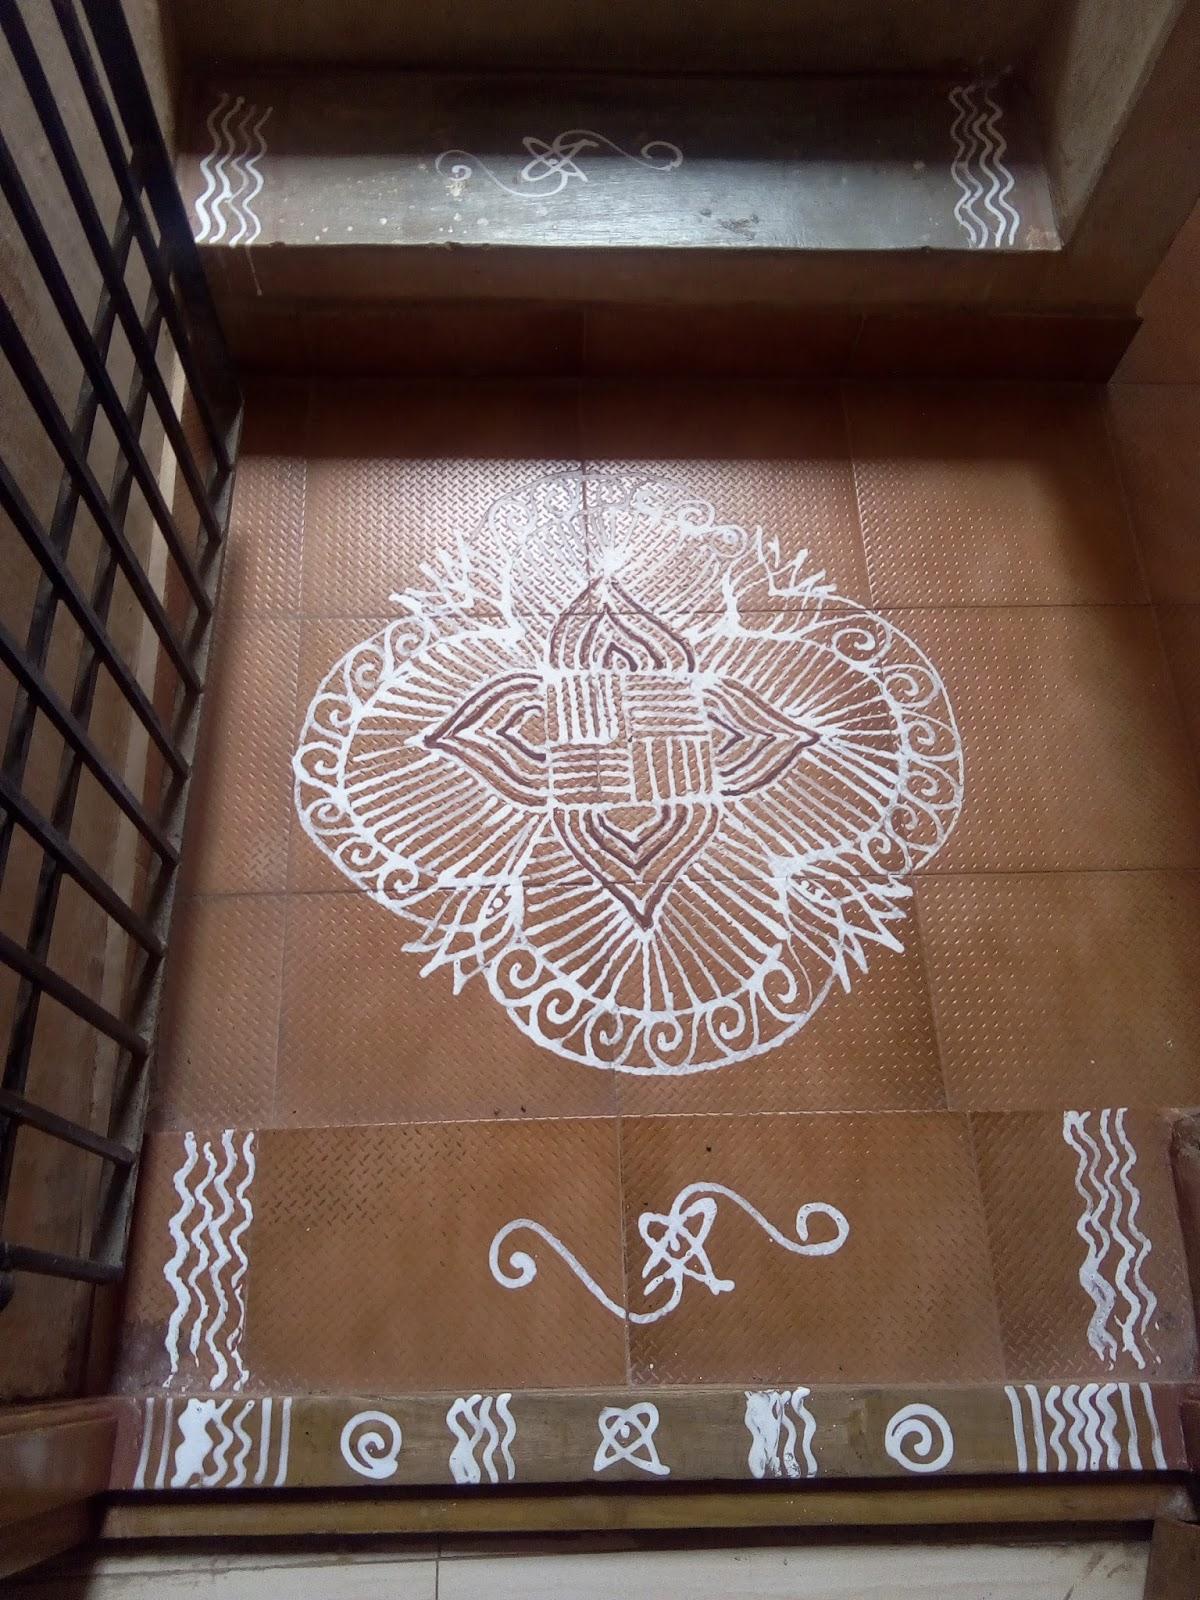 Kolangal kolam designs in wet flour for apartment and for Apartment kolam design